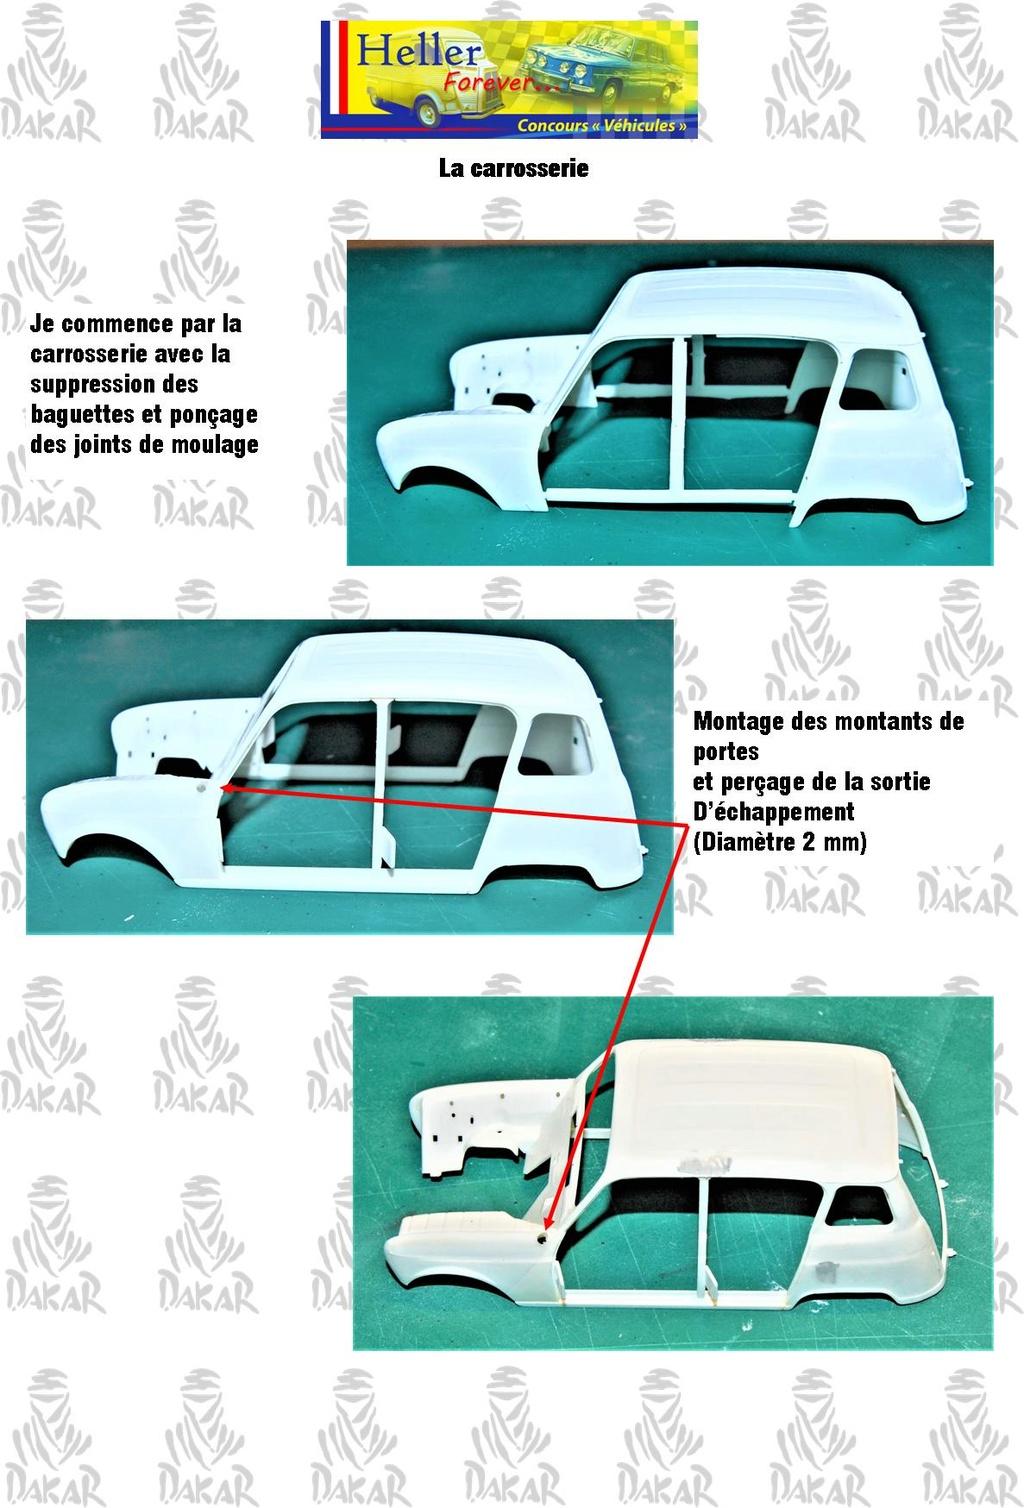 [1/24]Renault 4 l dakar 1980 Ref 80759 Image814